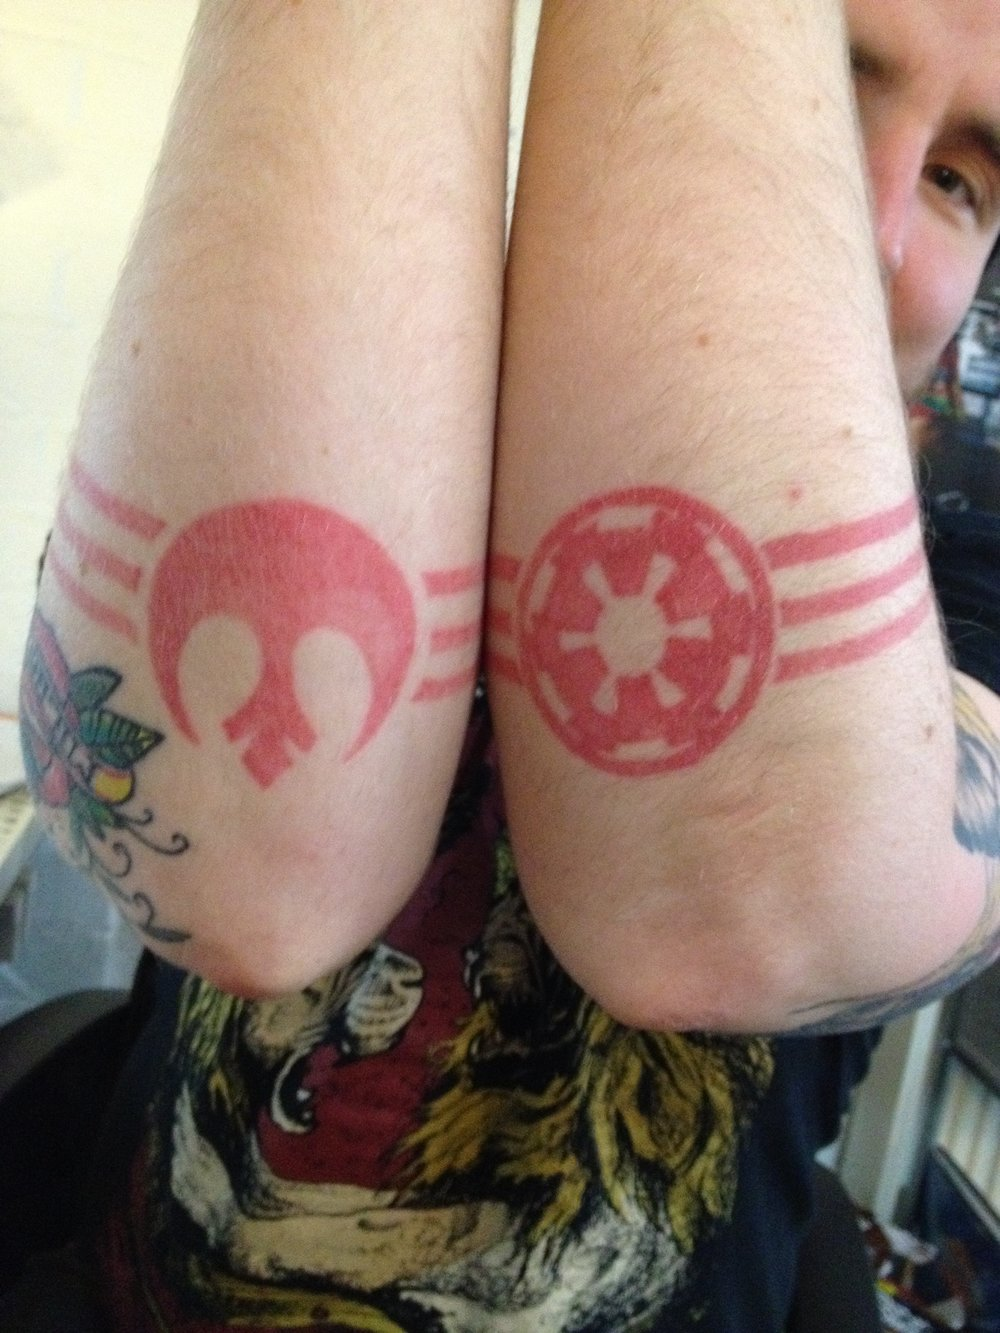 Michael's Rebellion and Empire Star Wars tattoo